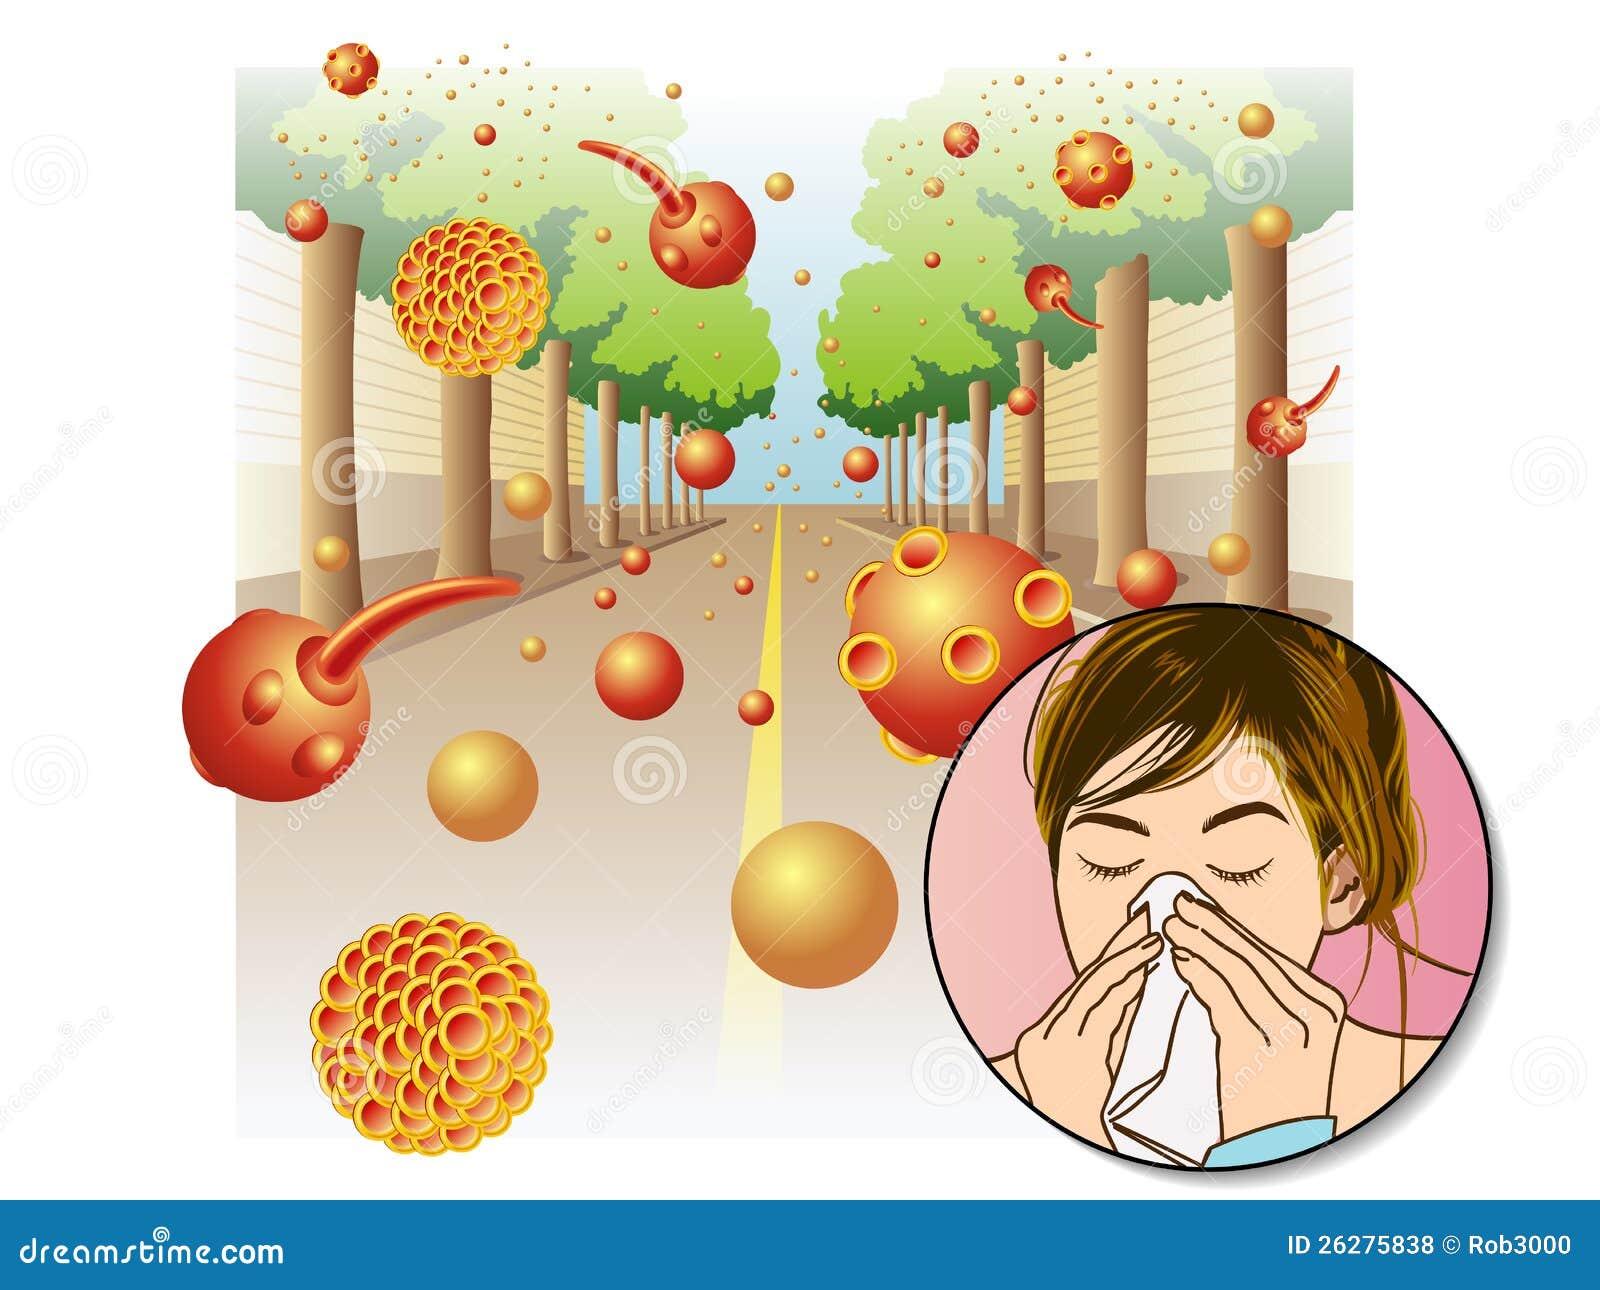 allergie de pollen photos libres de droits image 26275838. Black Bedroom Furniture Sets. Home Design Ideas